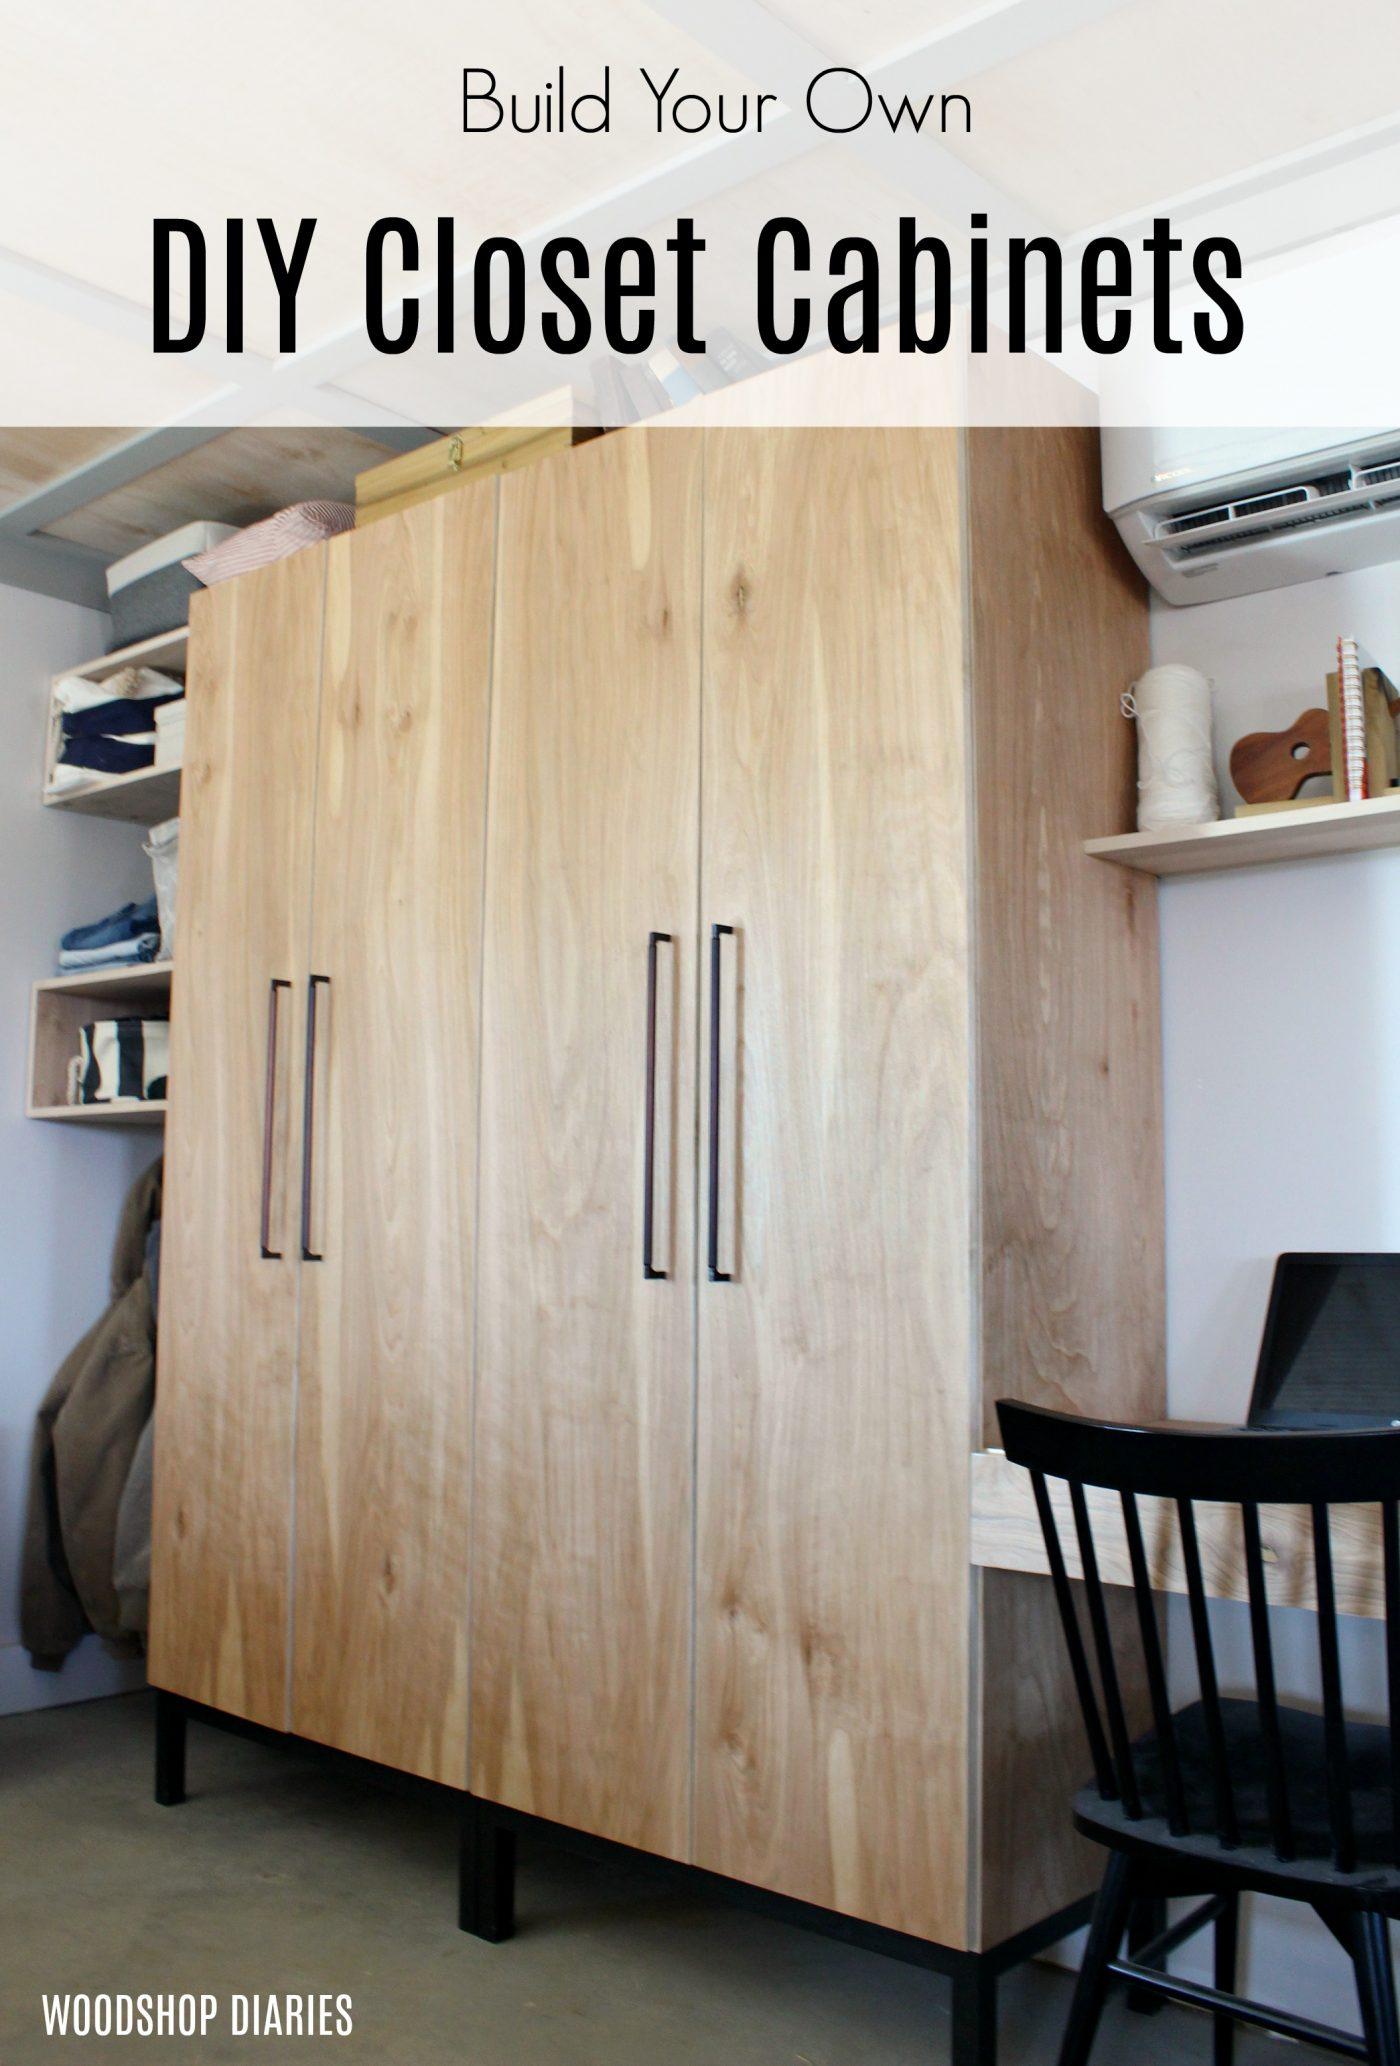 How to Build a DIY Closet Cabinet--With Closet Rod, Shoe Shelf, and Adjustable Shelves